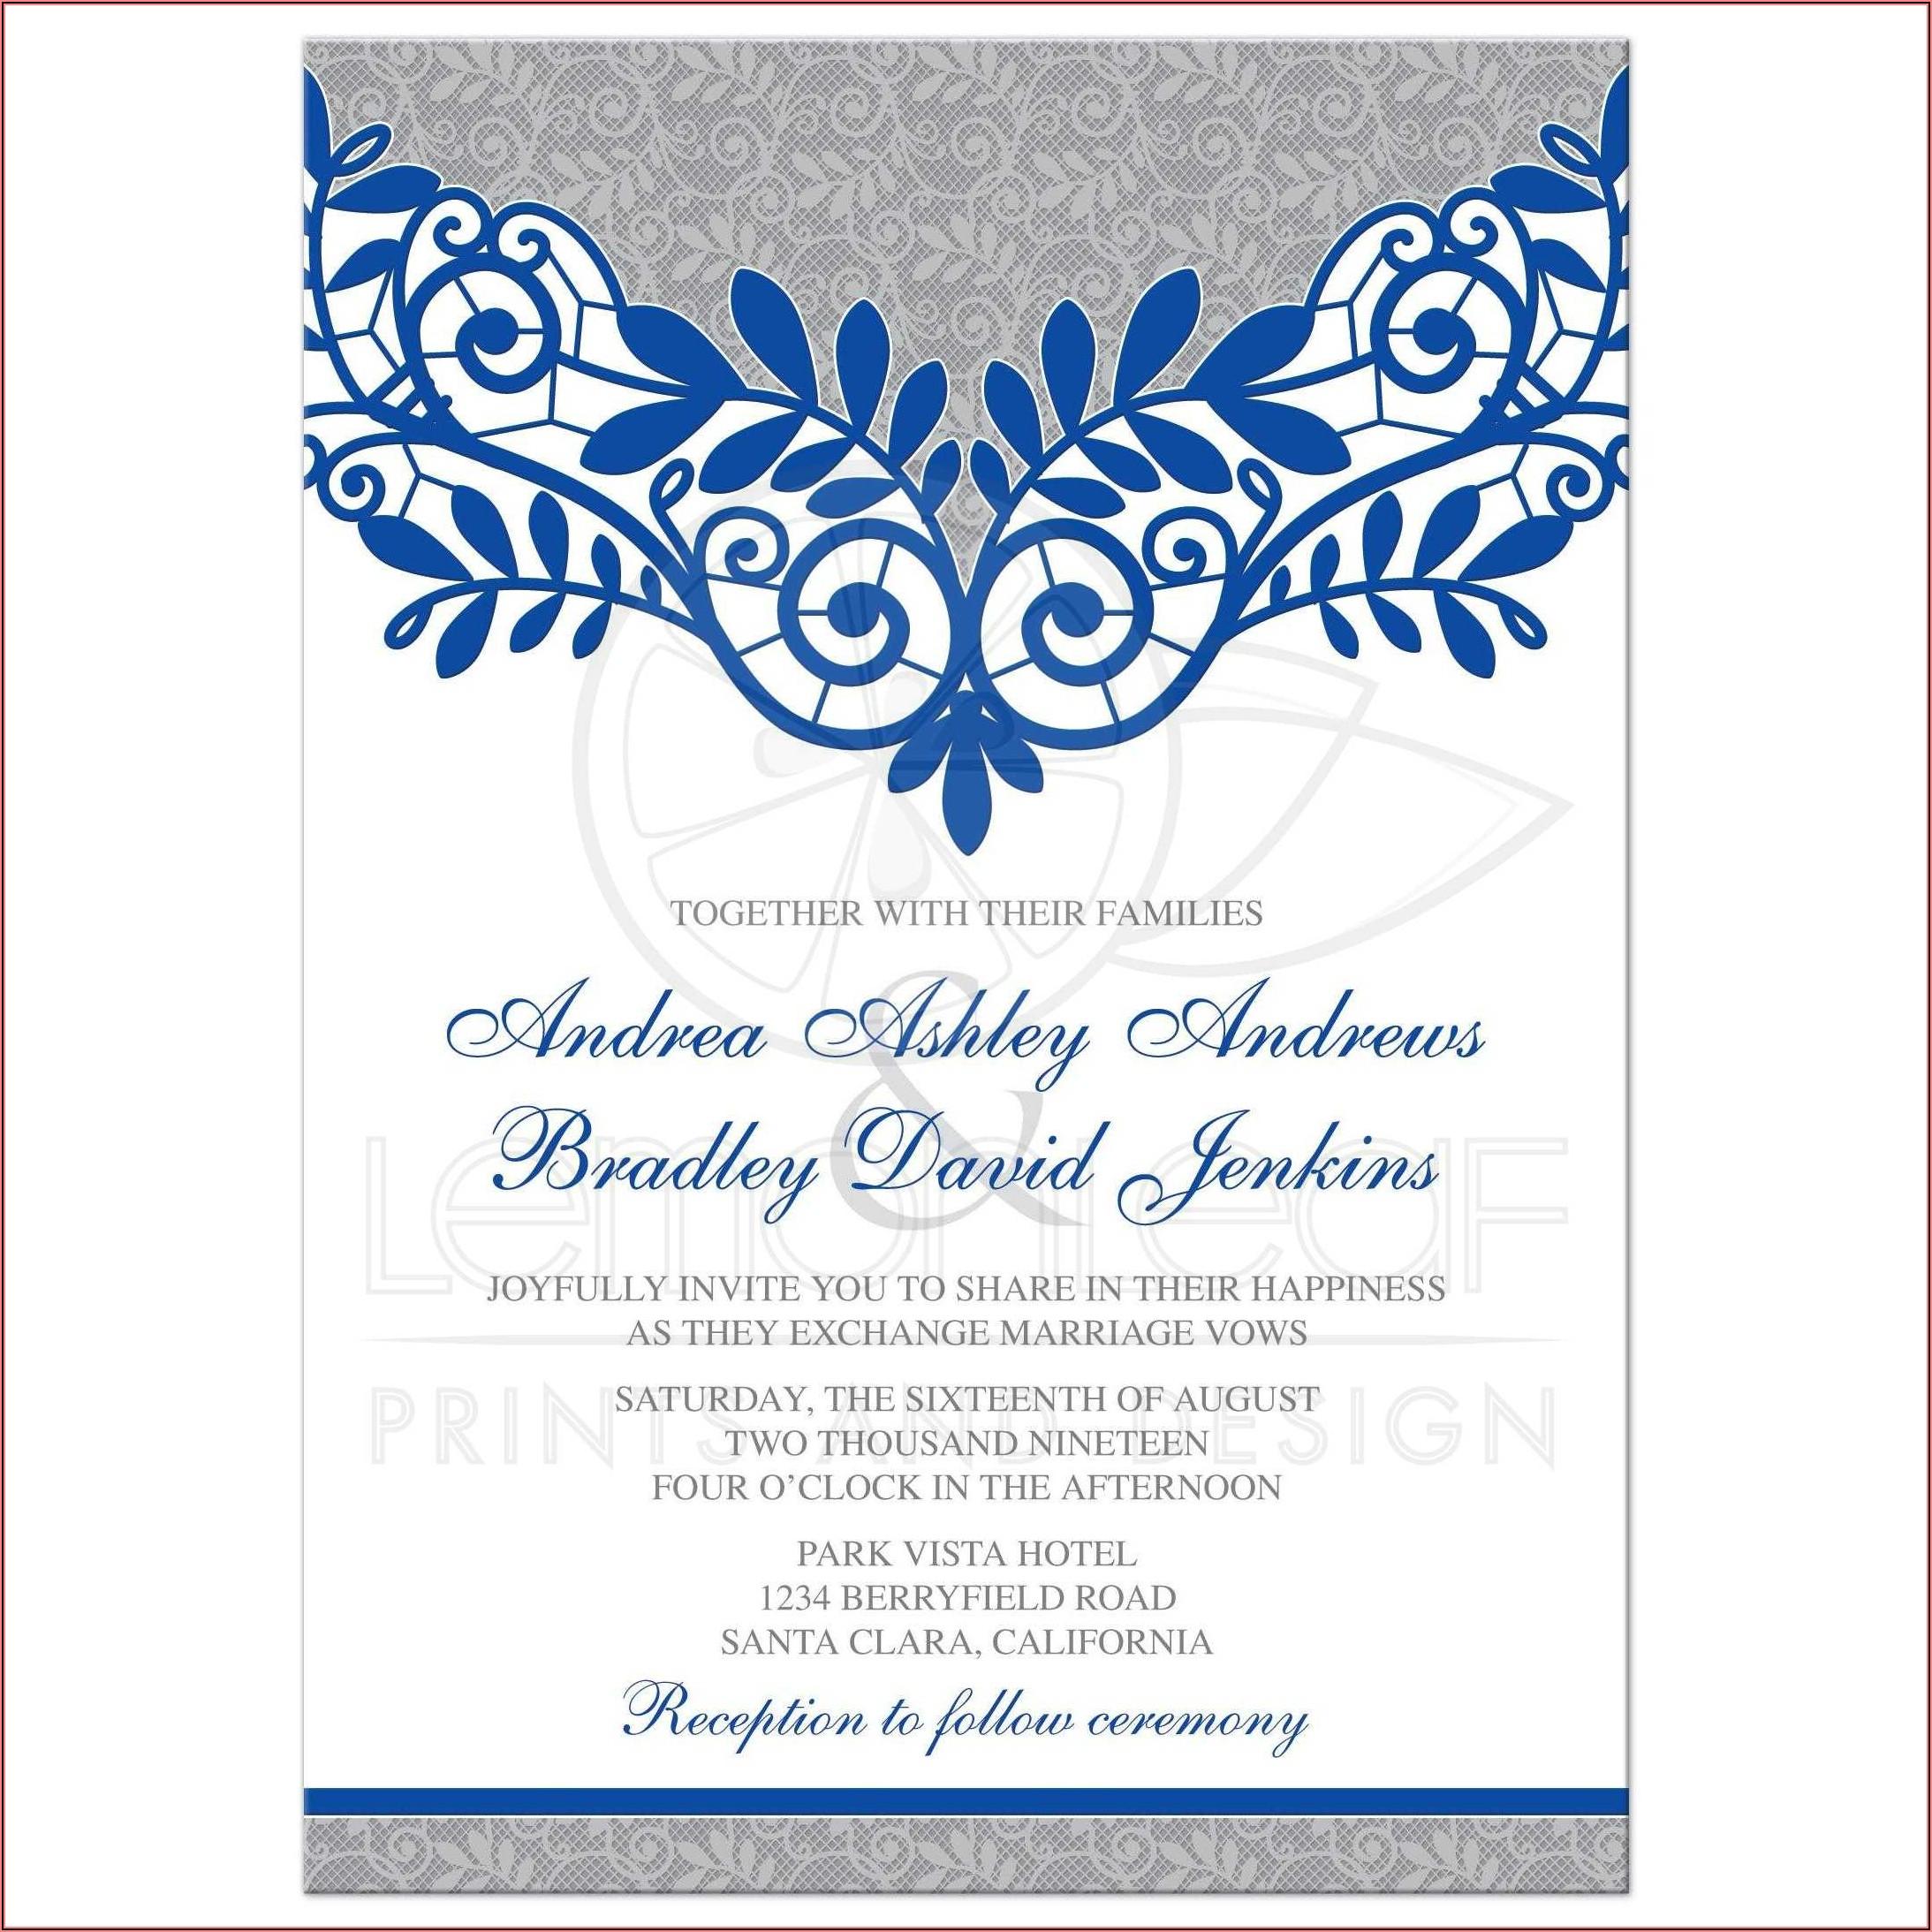 Royal Blue And White Wedding Invitation Templates